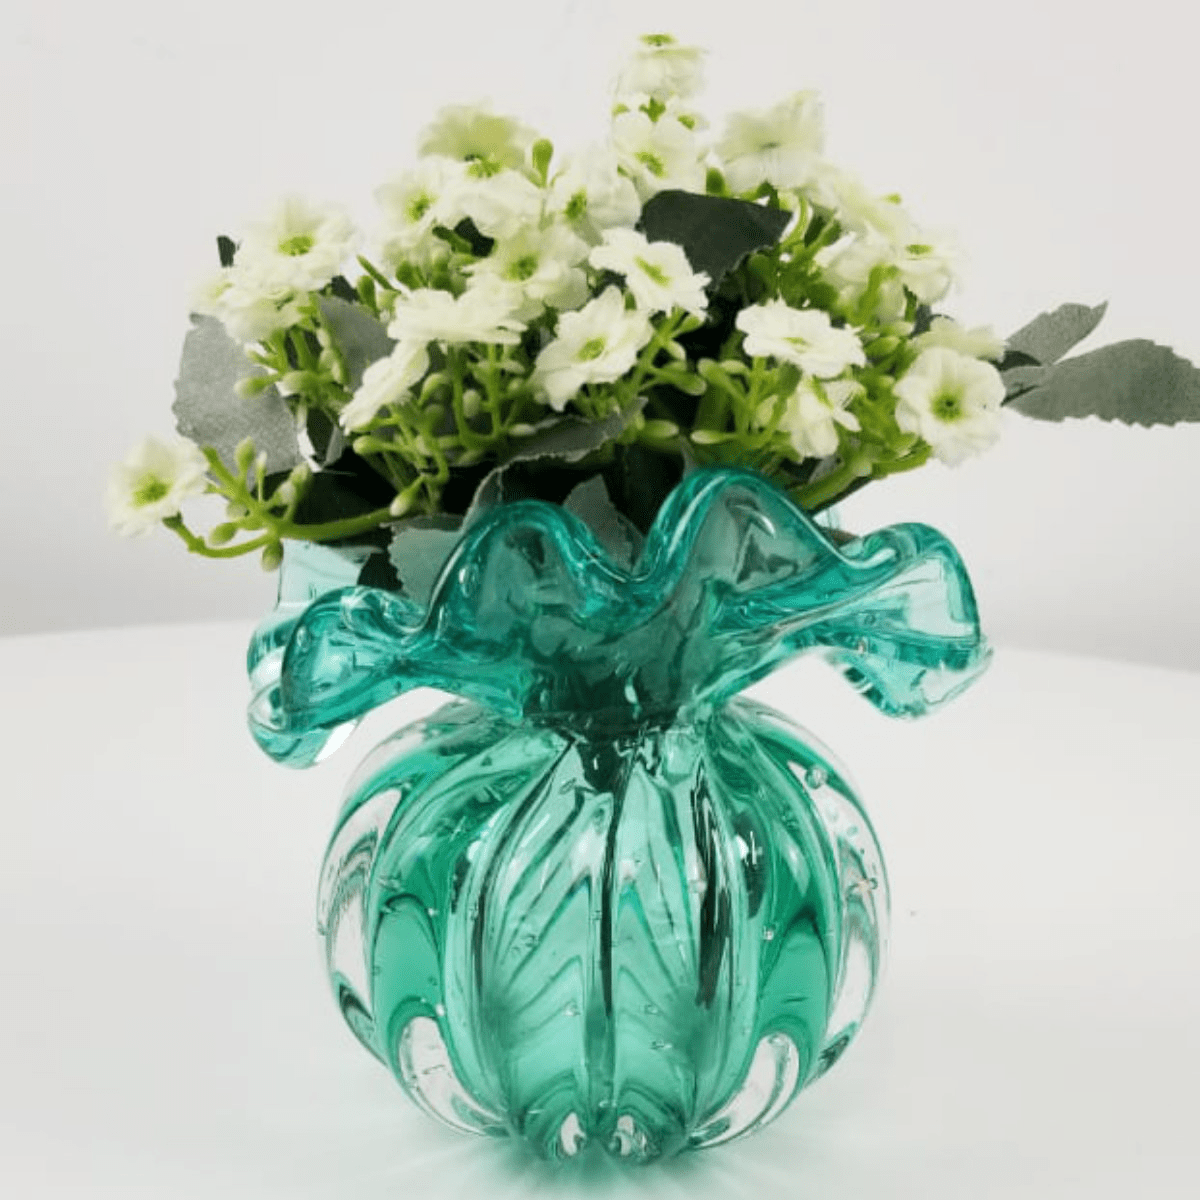 Vaso de Murano Trouxinha D'labone - Cristal Esmeralda 14cm